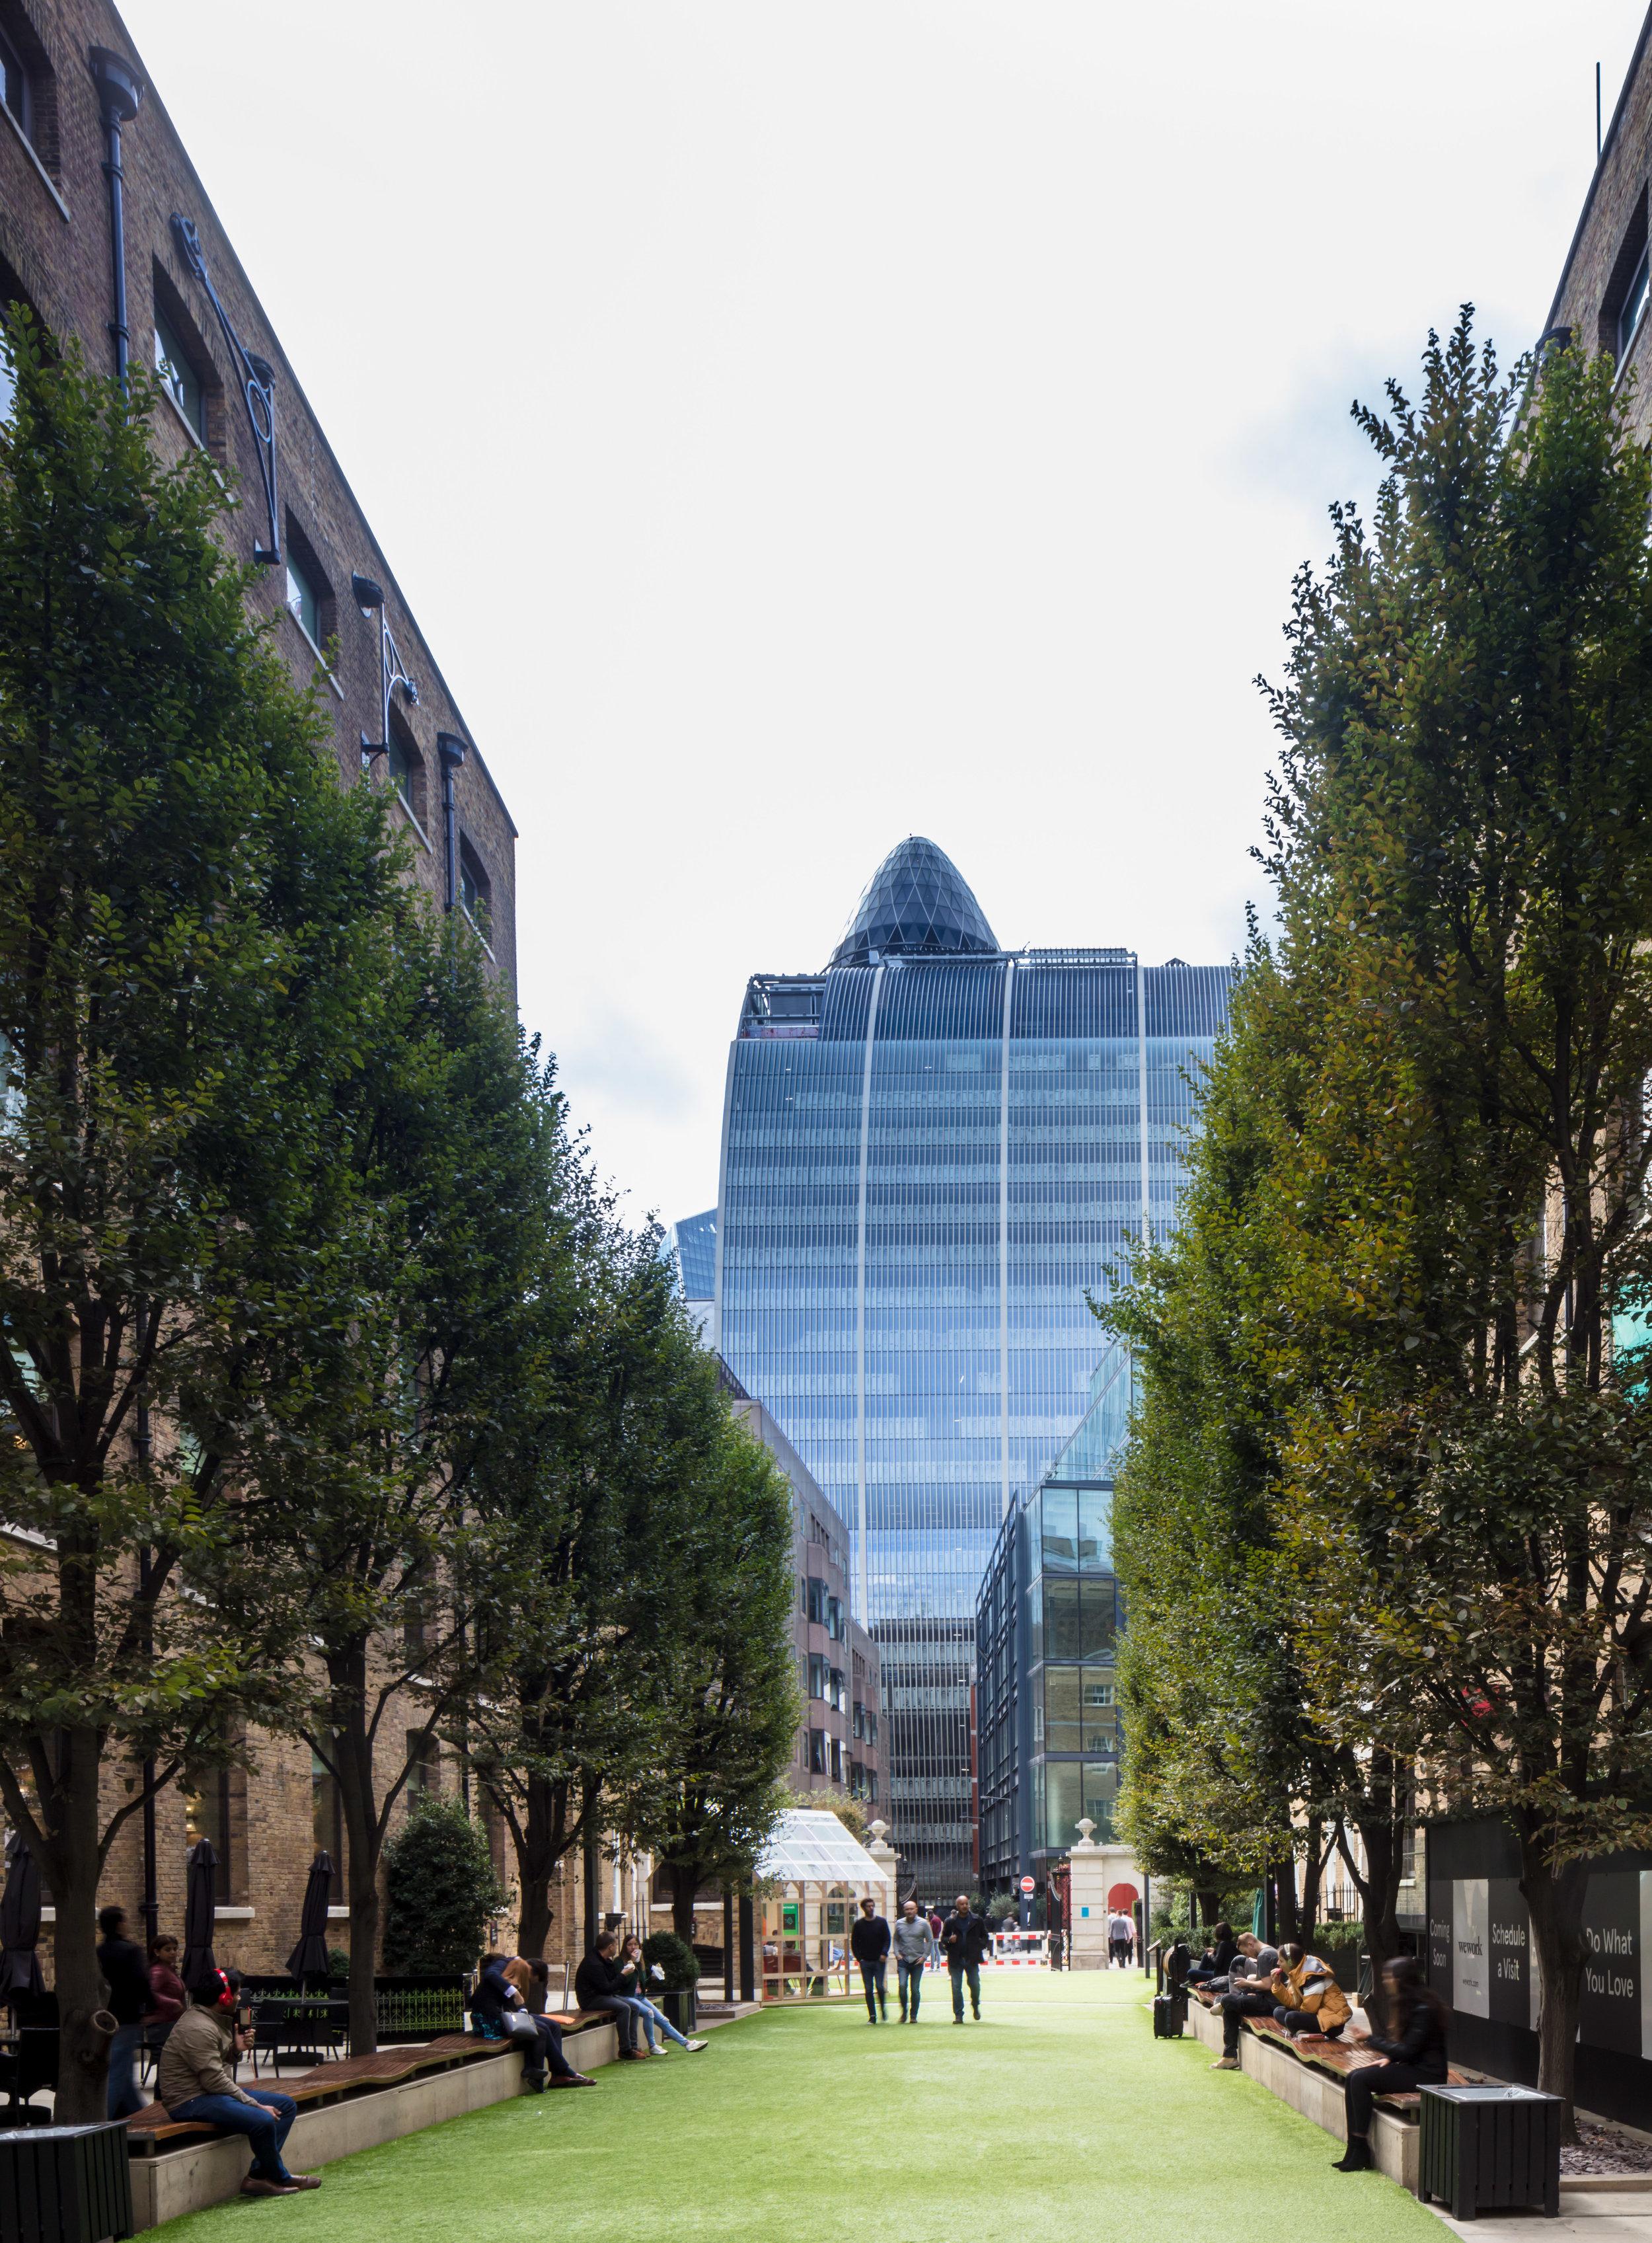 20180914_London_8-Devonshire-Square_Exteriors_Campus_02.jpg